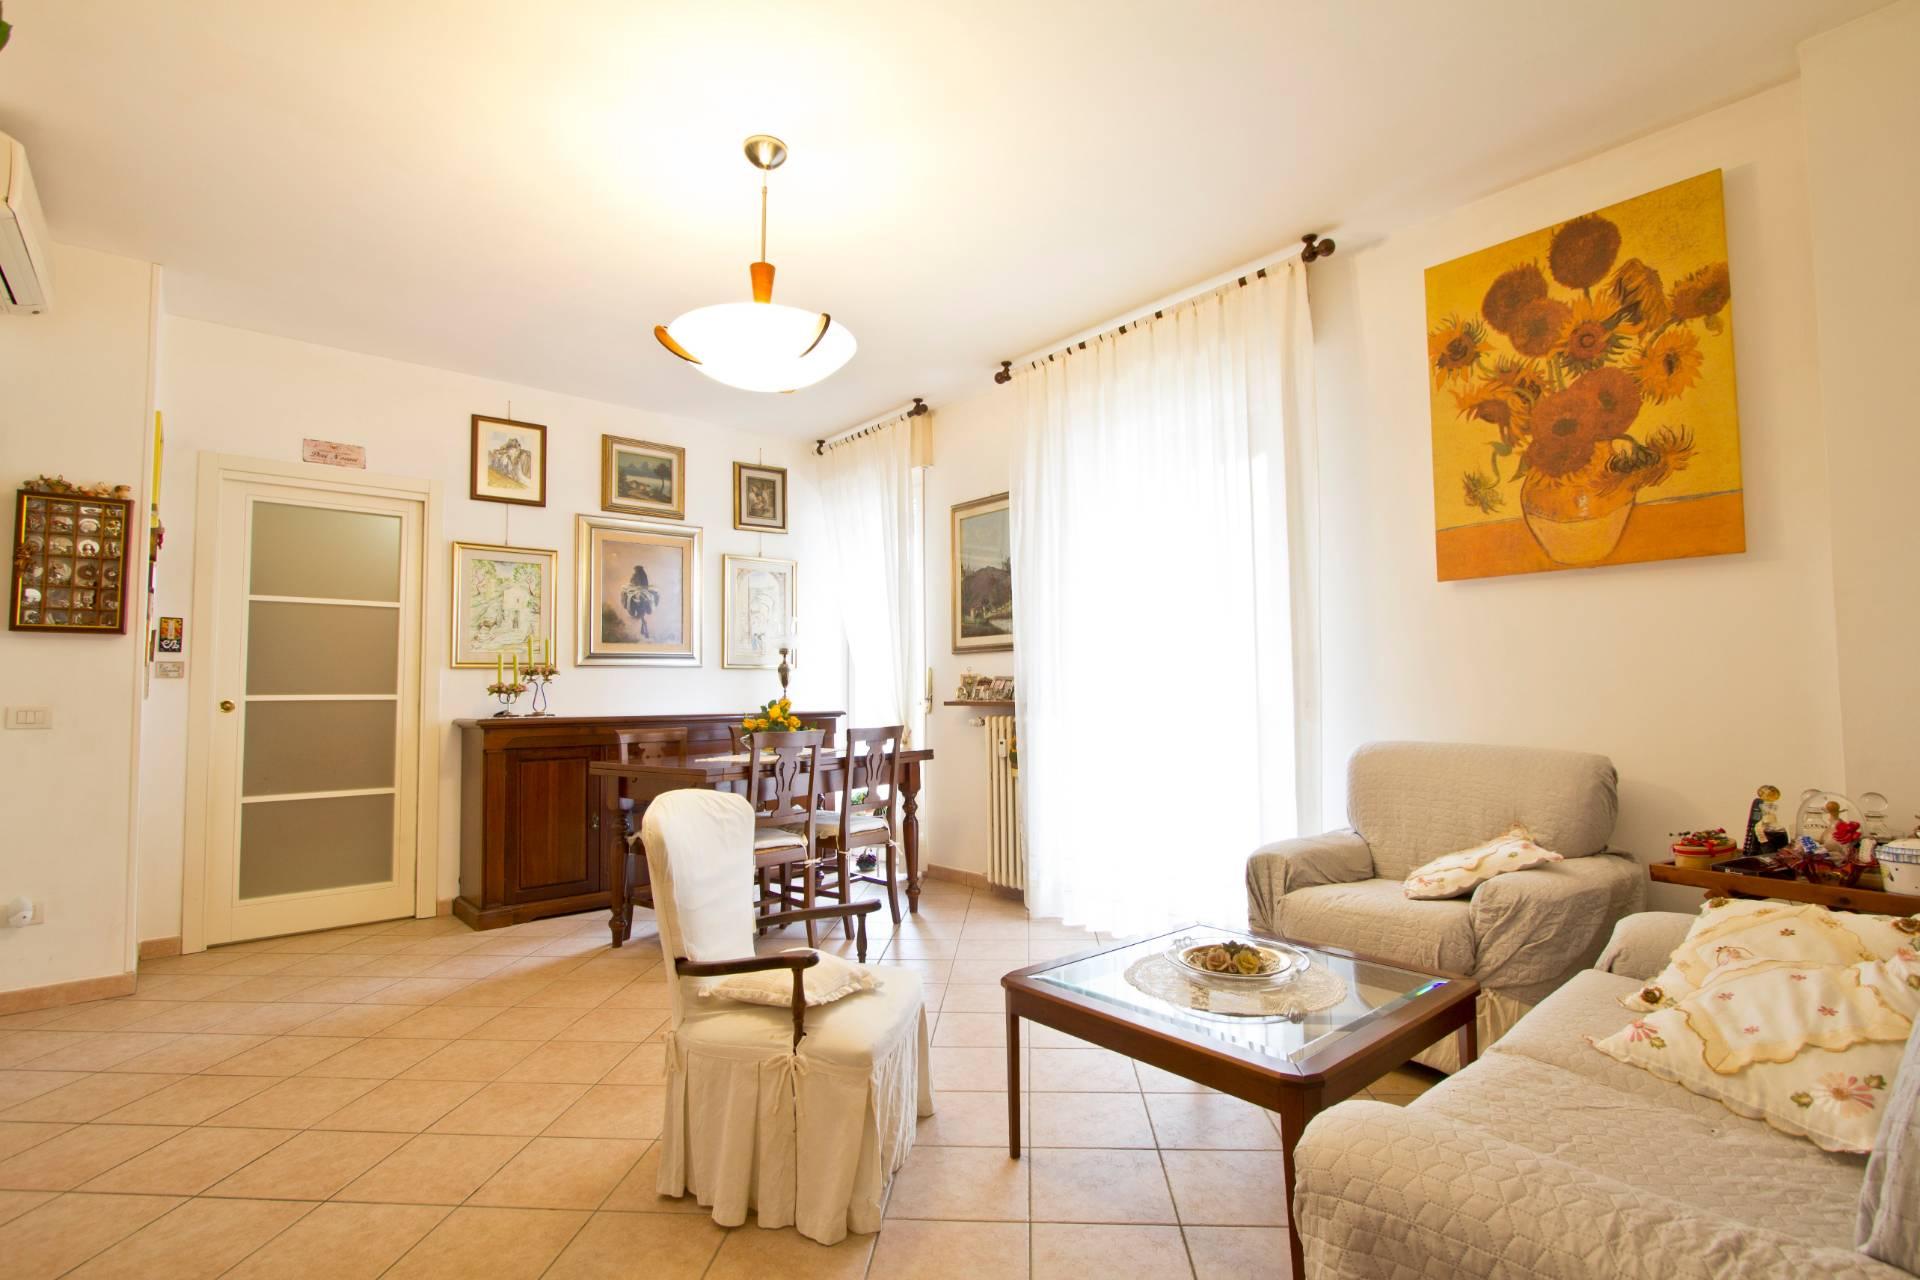 Appartamento VERONA vendita  Borgo Roma  Studio D